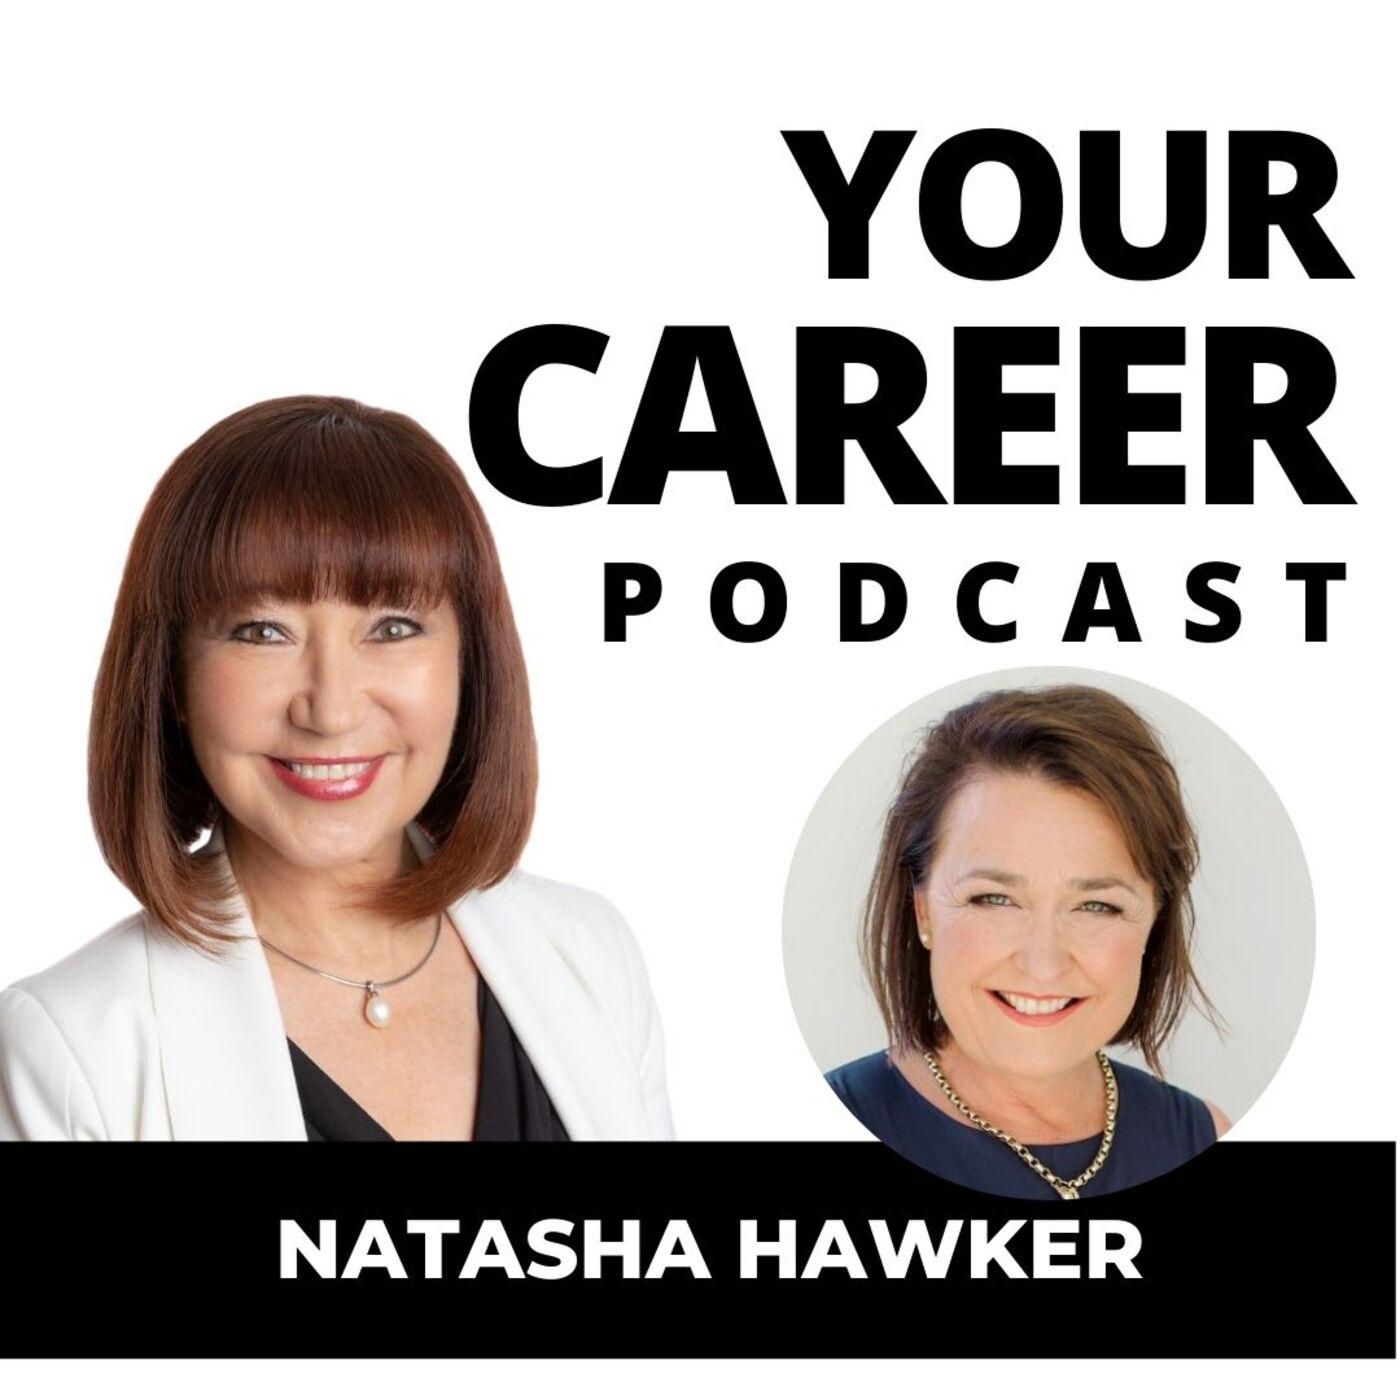 Natasha Hawker - CEO Employee Matters - Episode 205